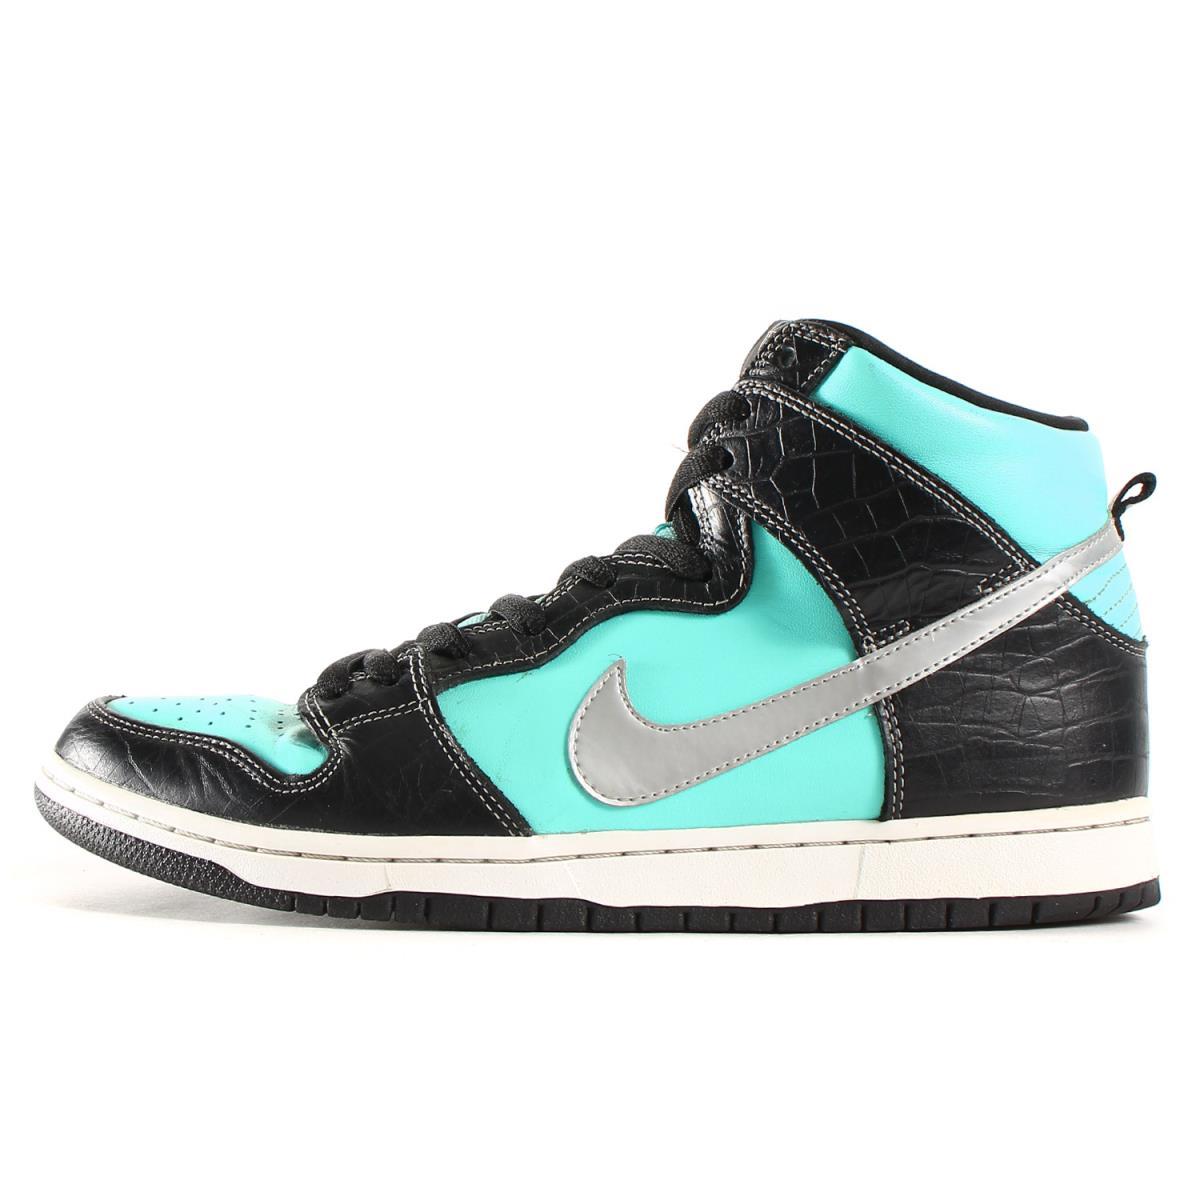 42356abe43f1 BEEGLE by Boo-Bee  NIKE (Nike) X DIAMOND SUPPLY DUNK HIGH PREMIUM SB ...